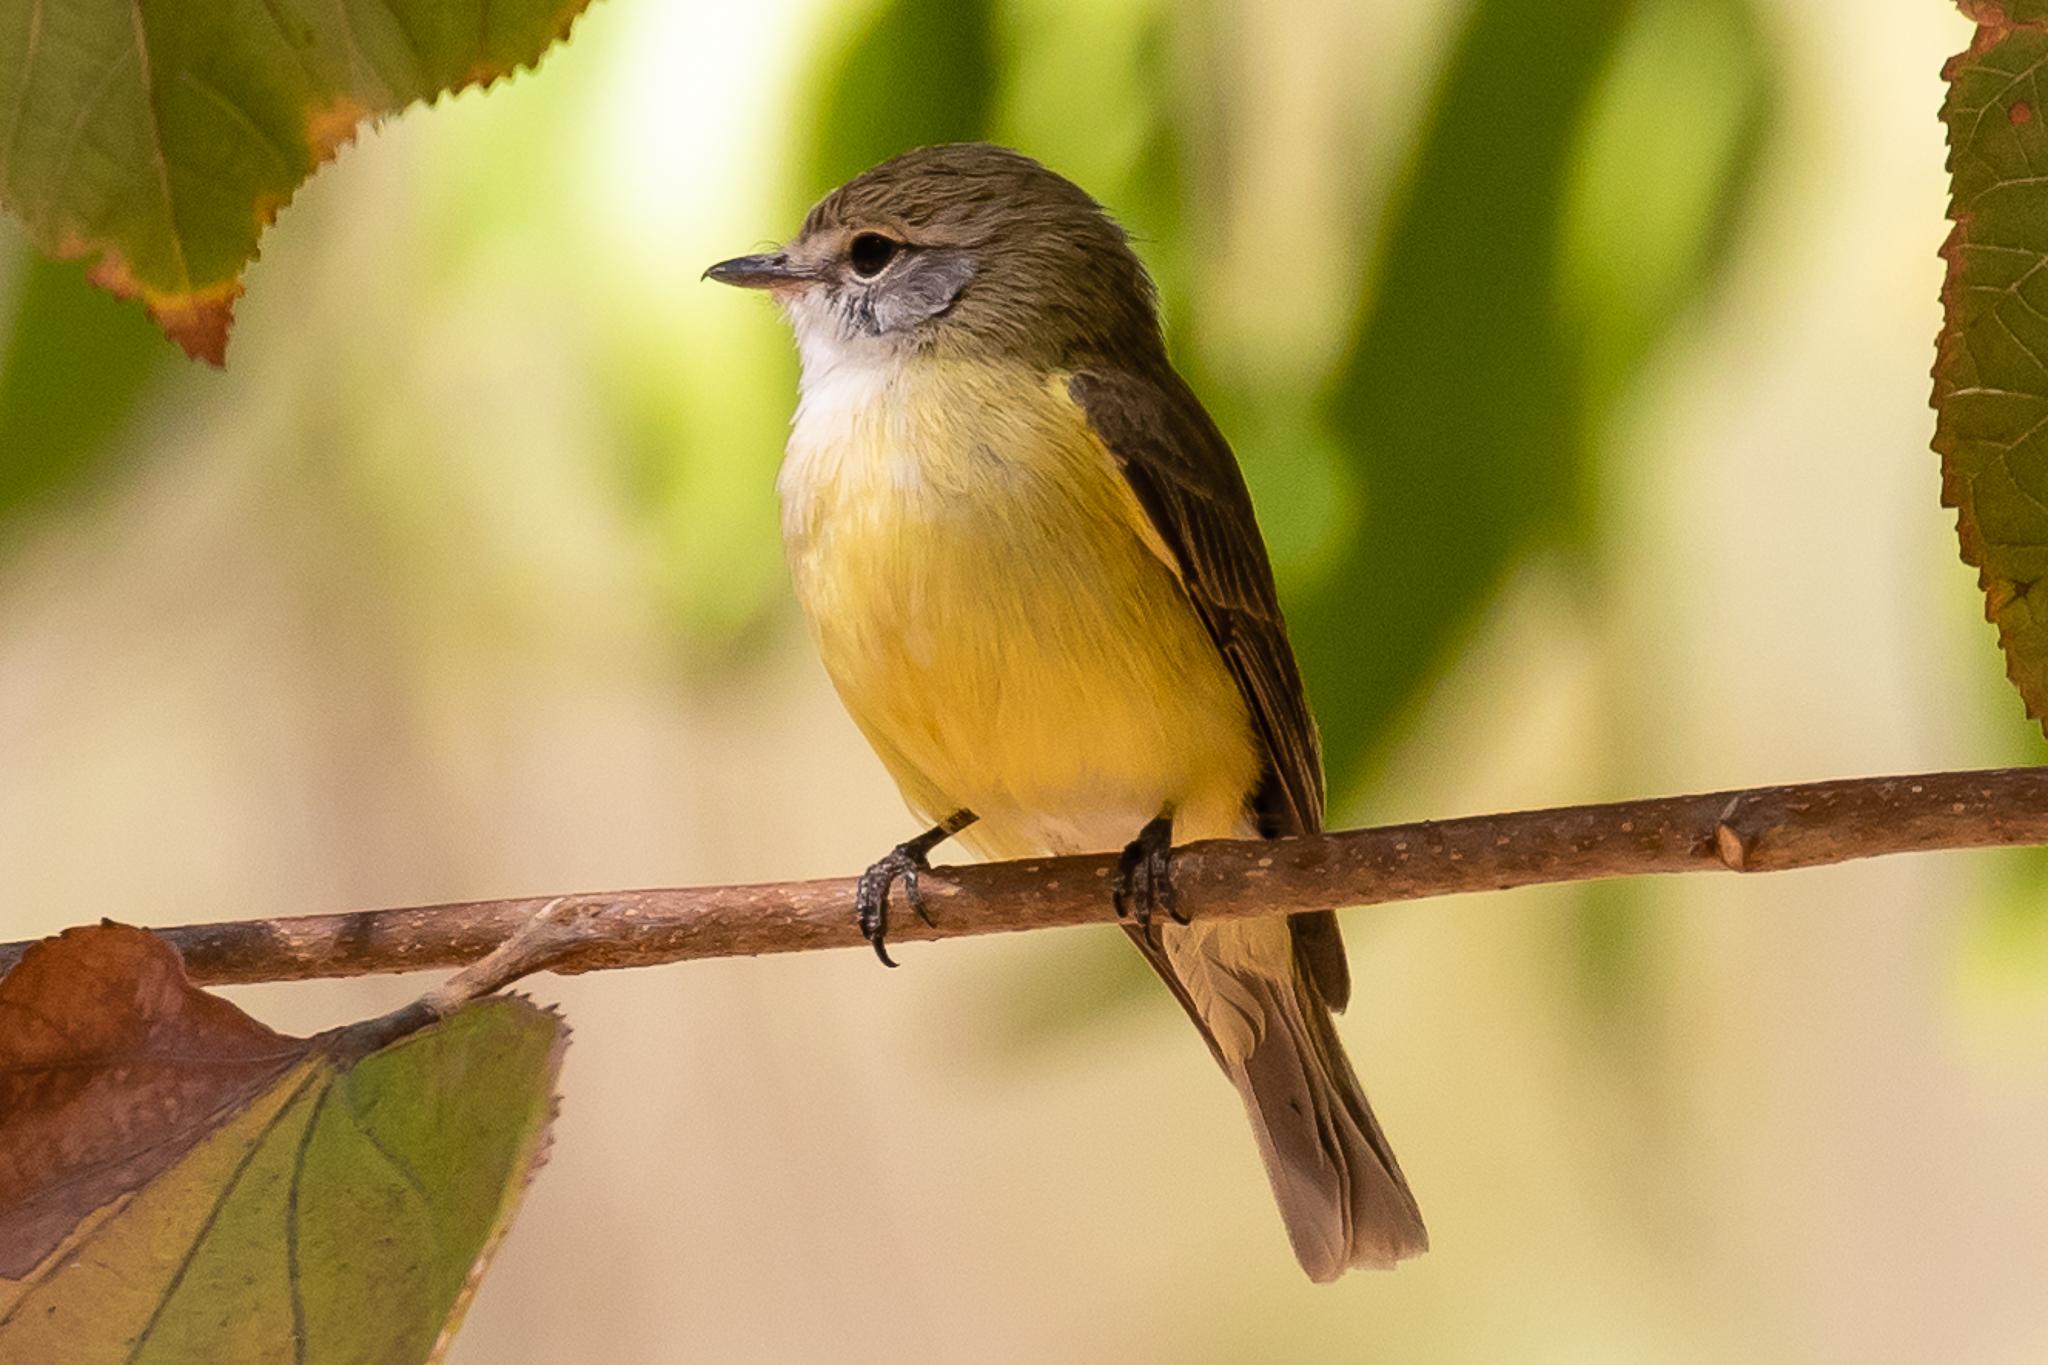 Lemon-bellied Flycatcher at Edith Falls near Katherine, NT.